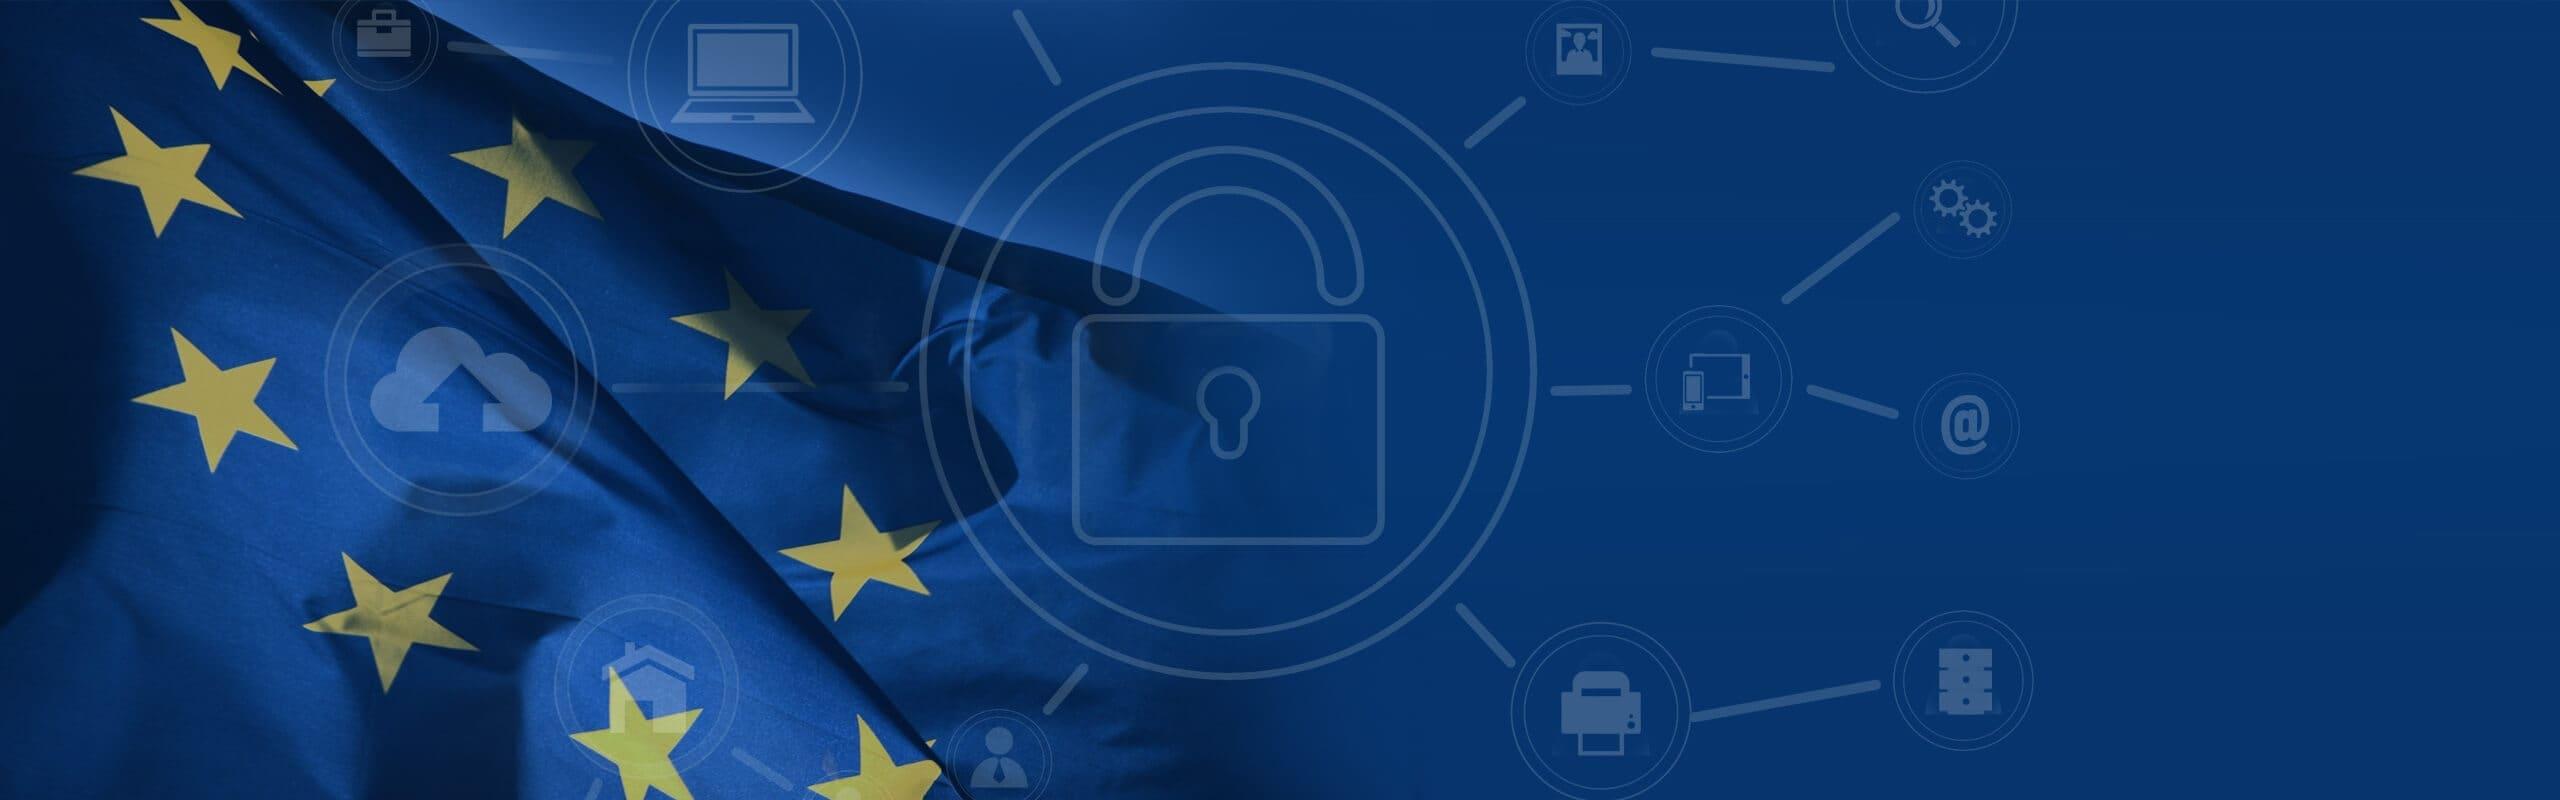 GDPR global data protection regulation